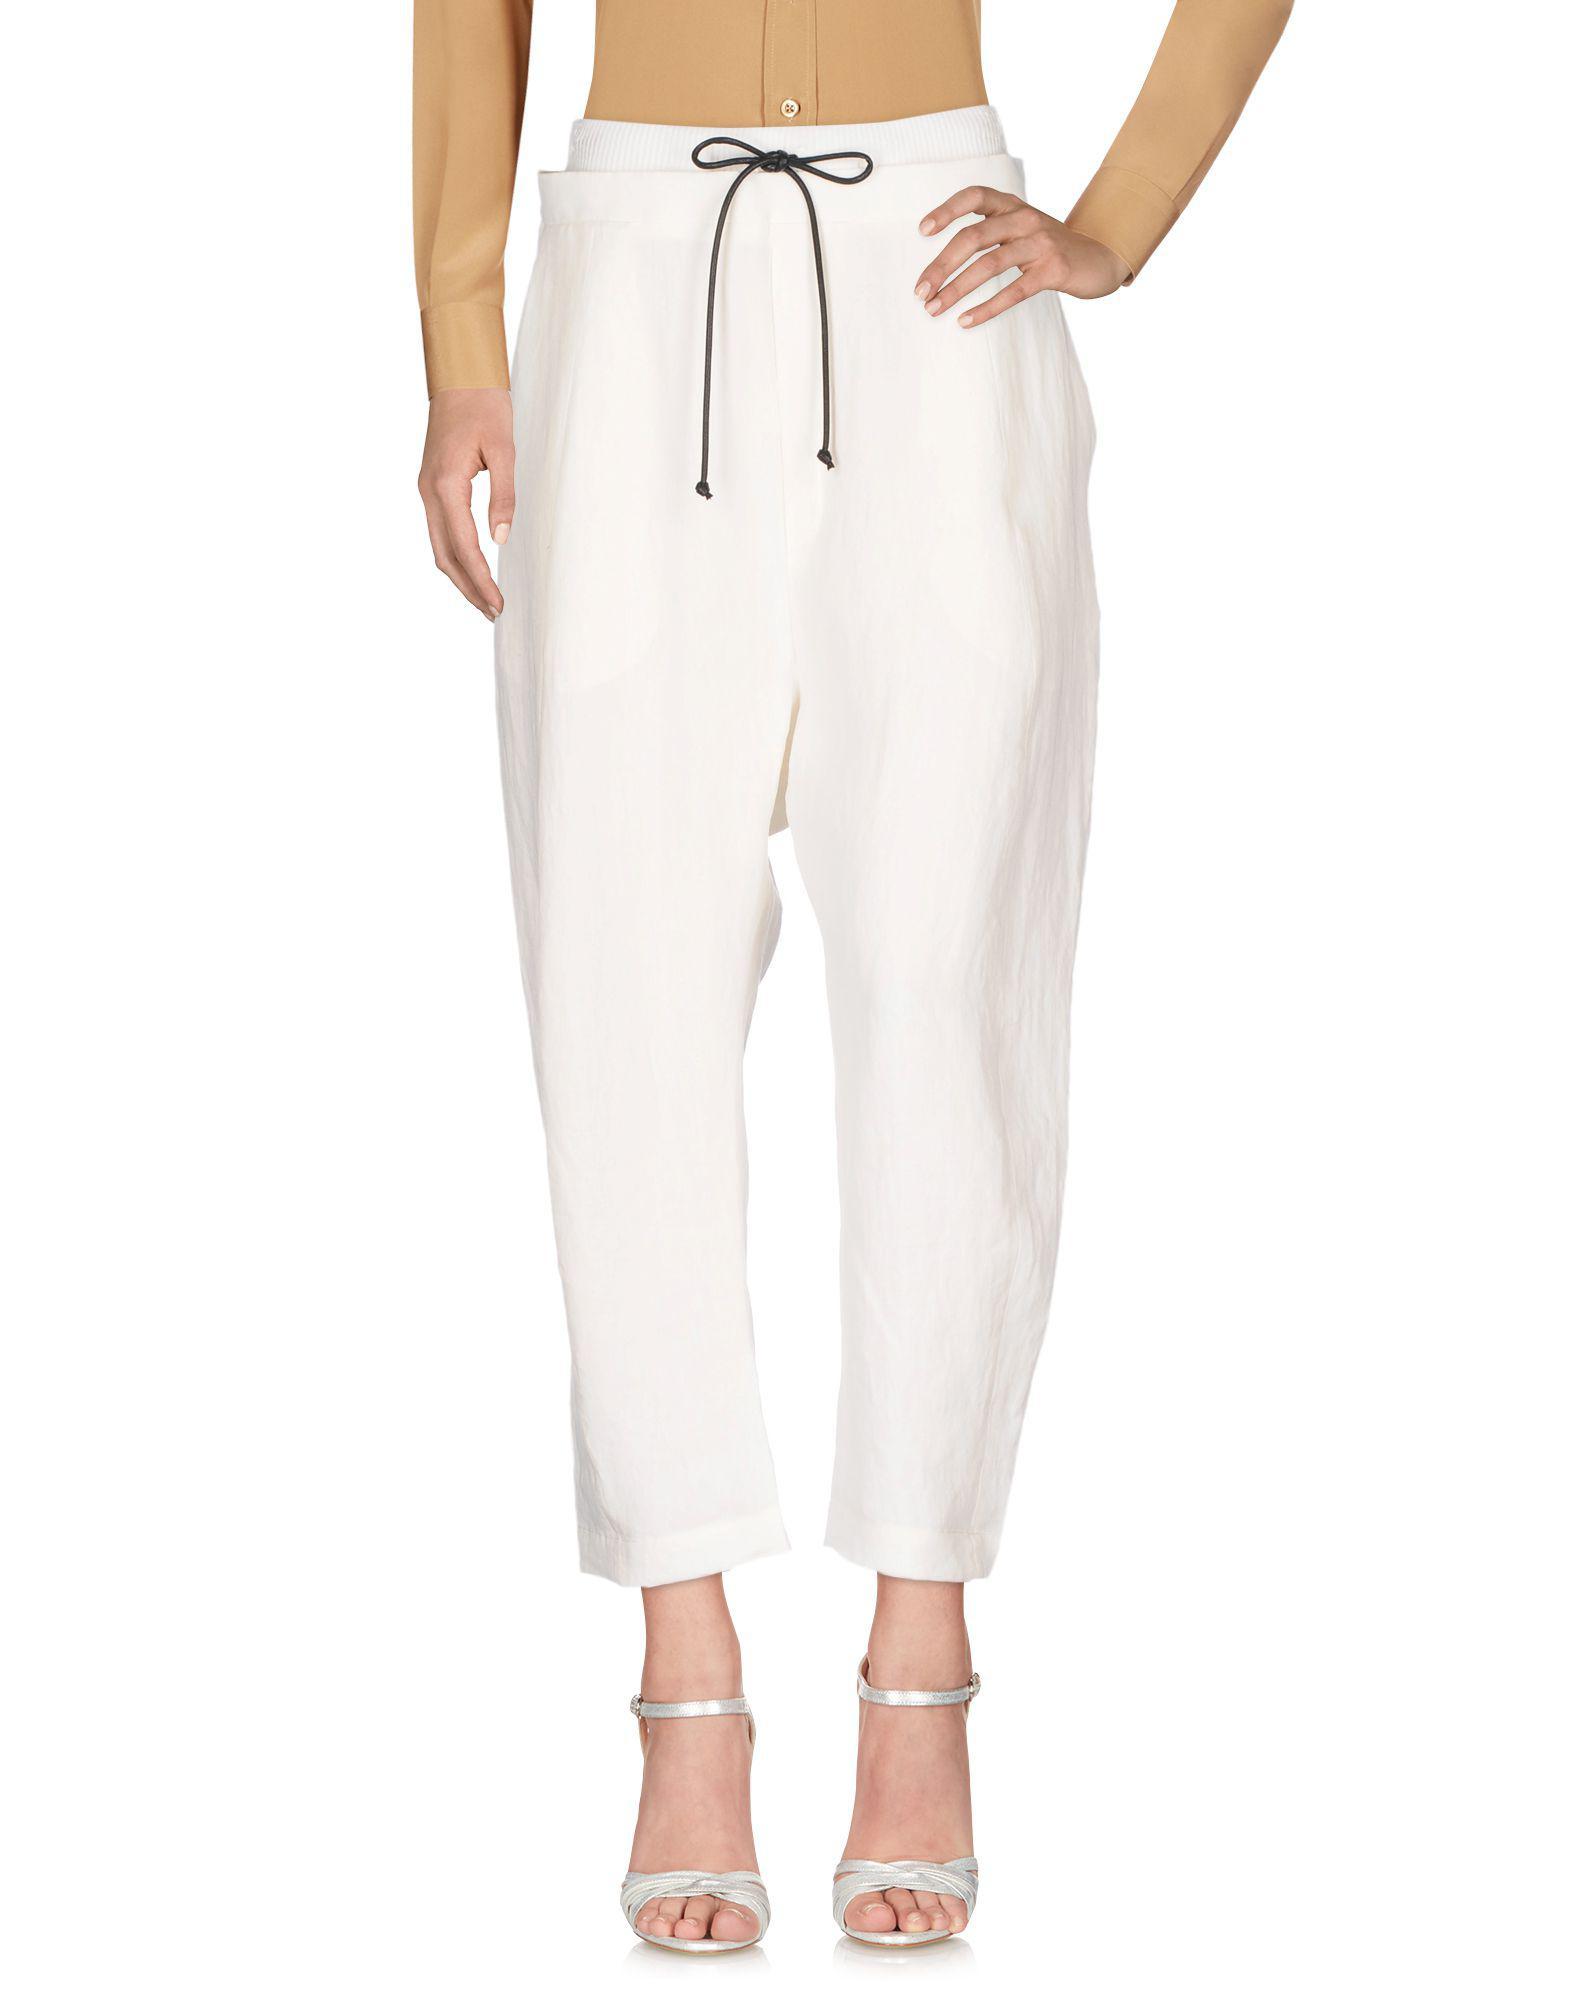 Les Pantalons - 3/4-pantalon Longueur Isabel Benenato szgAlqzjg